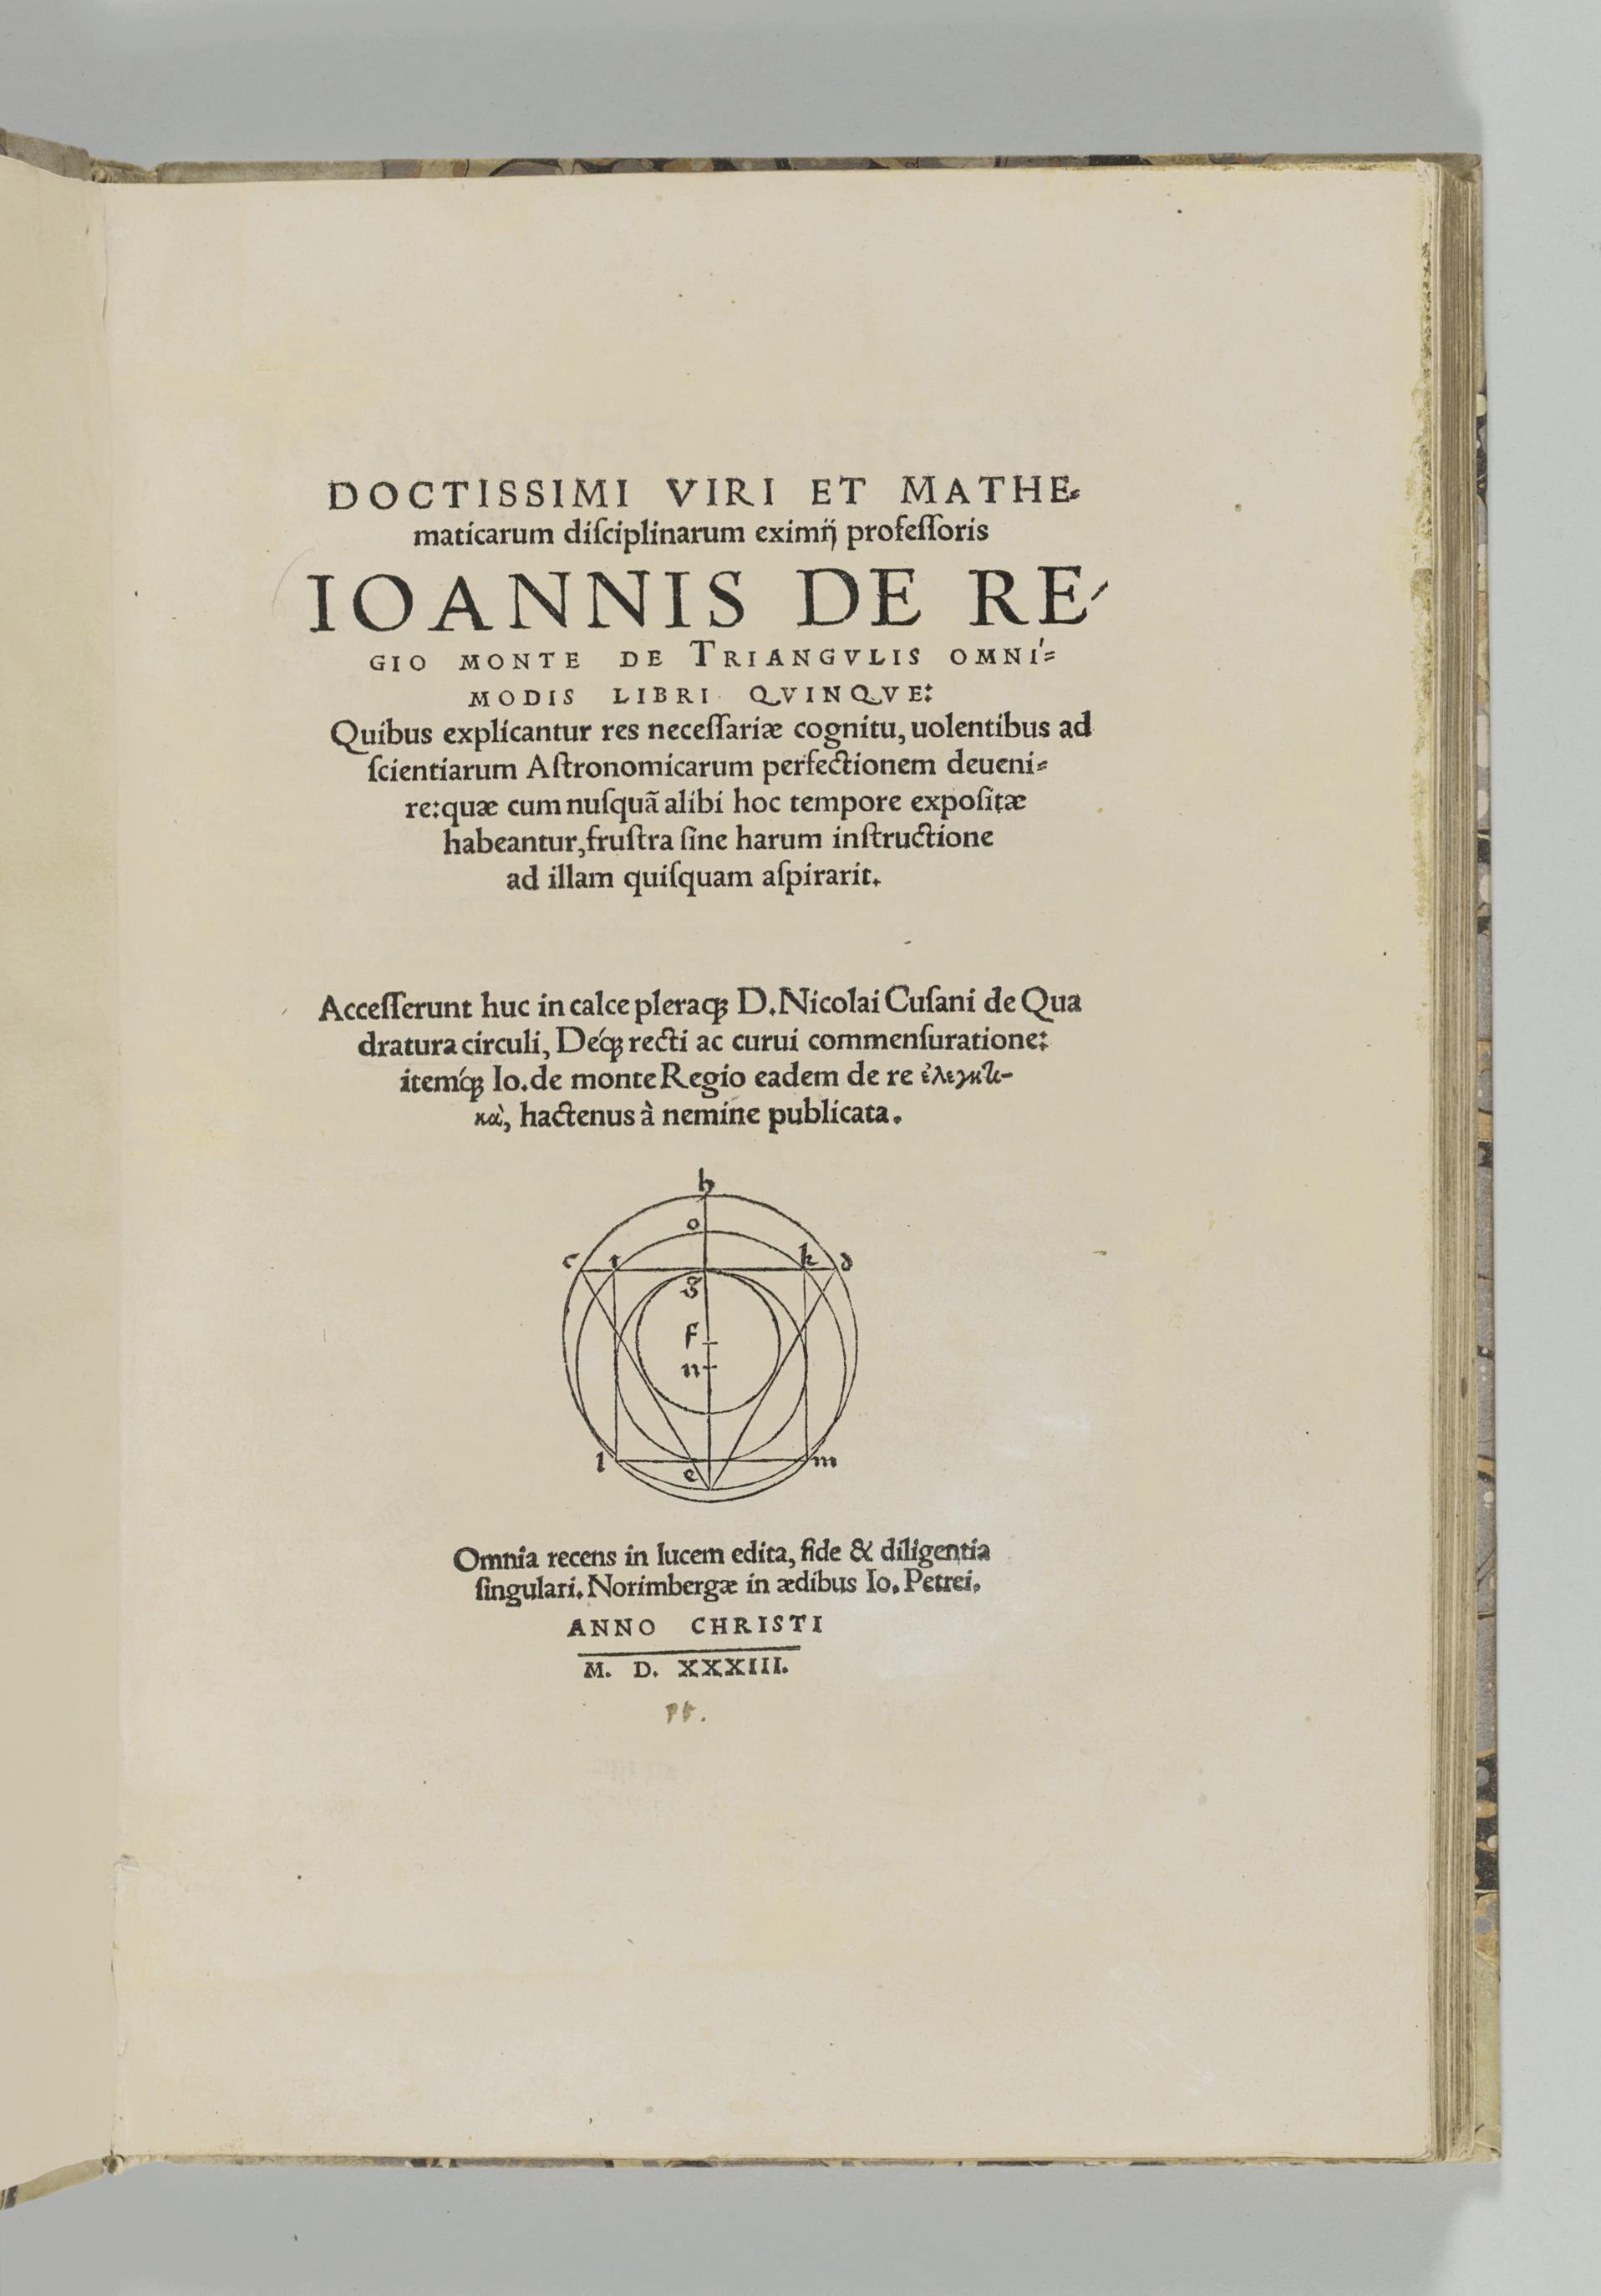 REGIOMONTANUS (Johann MÜLLER 1436-1476). De triangulis omnimodis libri quinque... accesserunt huc in calce pleraque D. Nicolai Cusani de Quadratura circuli. Edited by J. Schner. Nuremberg: Johann Petri, 1533.